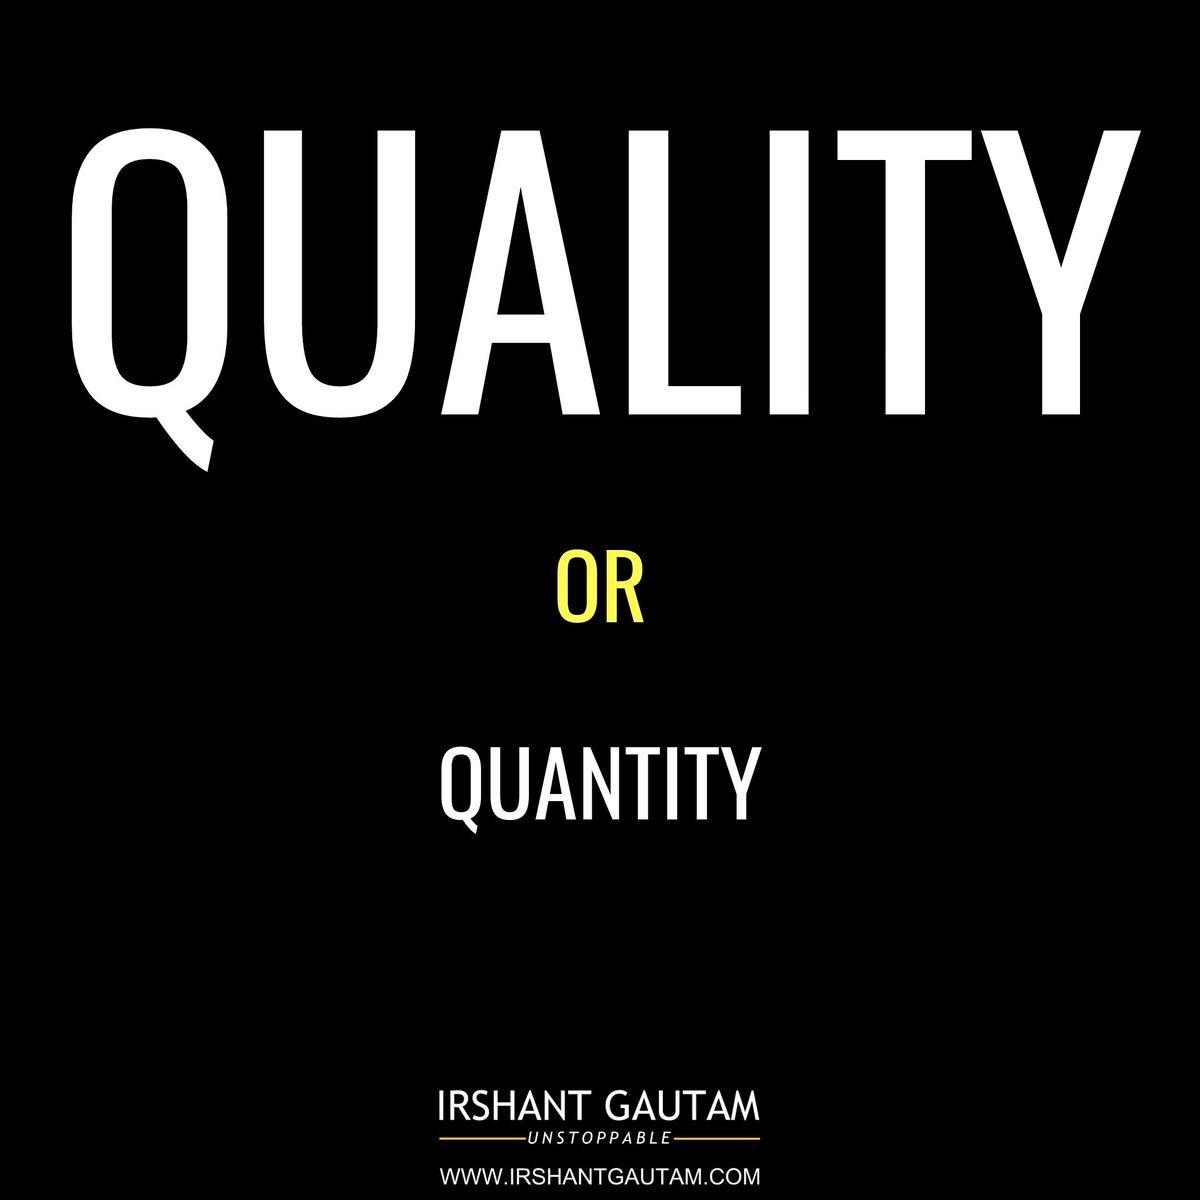 #qualitynotquantity #qualityoverquantity #qualityproduct #qualitycontent #qualitytime❤️ #qualitybags #qualityclothing #qualitynails #qualitywork #qualitytimewithfamily #qualityfood #qualitygoods #qualityproducts #qualitytime #qualitymusic #qualitymatters #qualityhair https://t.co/SZLSQ6yrIk